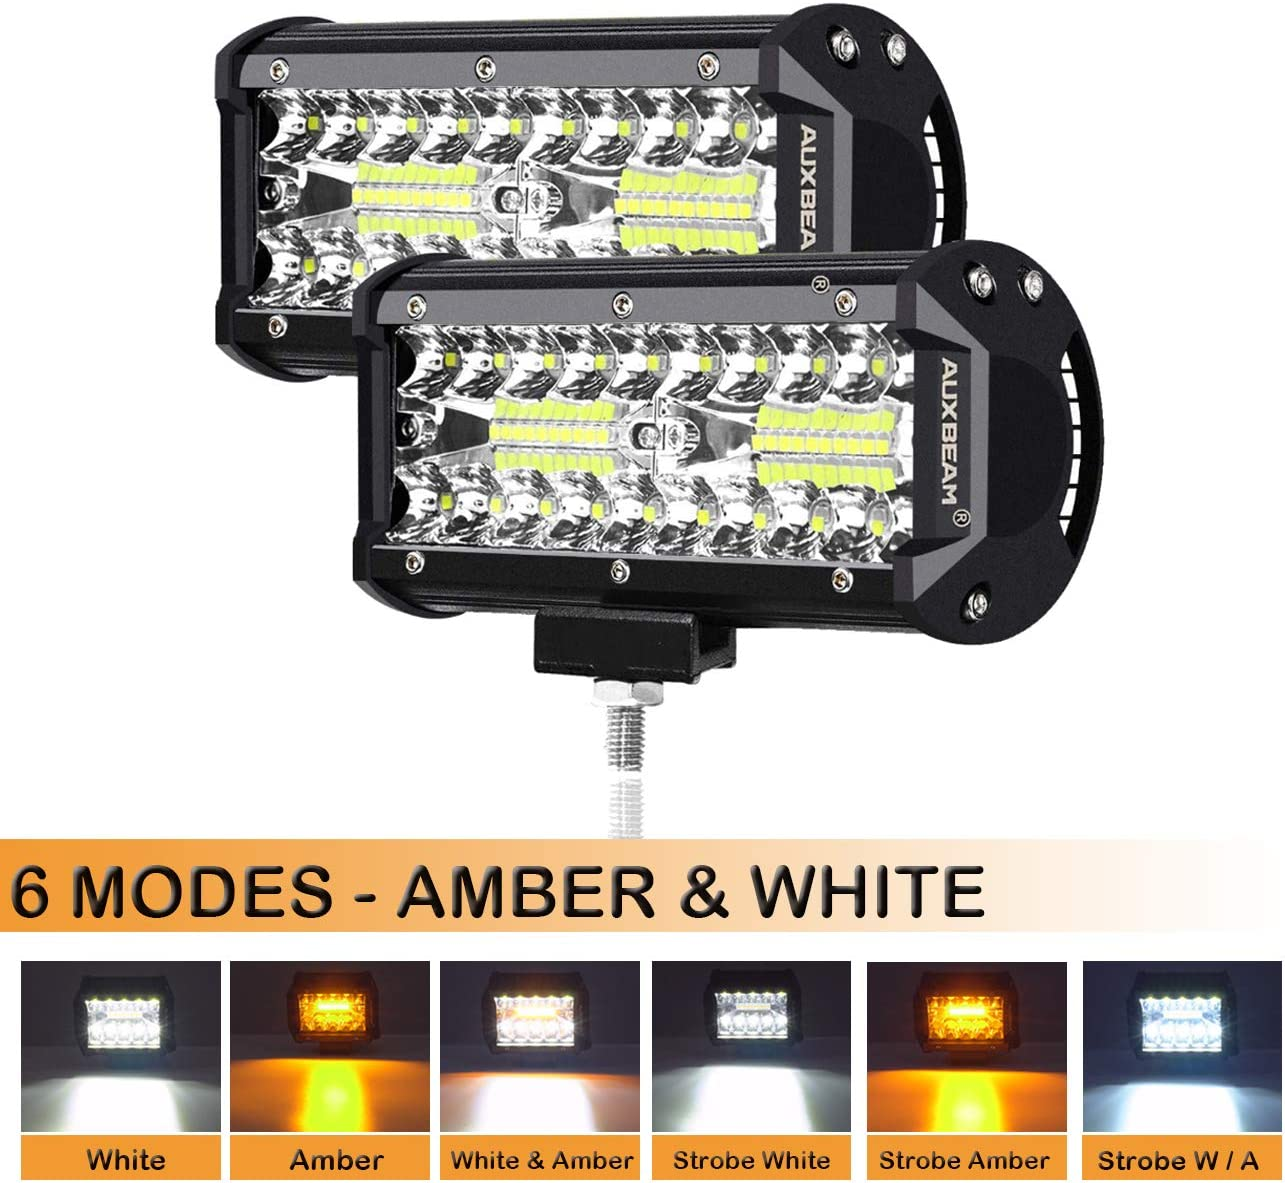 Auxbeam 7 Inch LED Light Bar 120W Light Pod Offroad Driving Light Spot LED Work Light Pod Lights with SIX Modes for Trucks Car Pickup ATV Jeep Boat Golf Cart(Pack of 2)